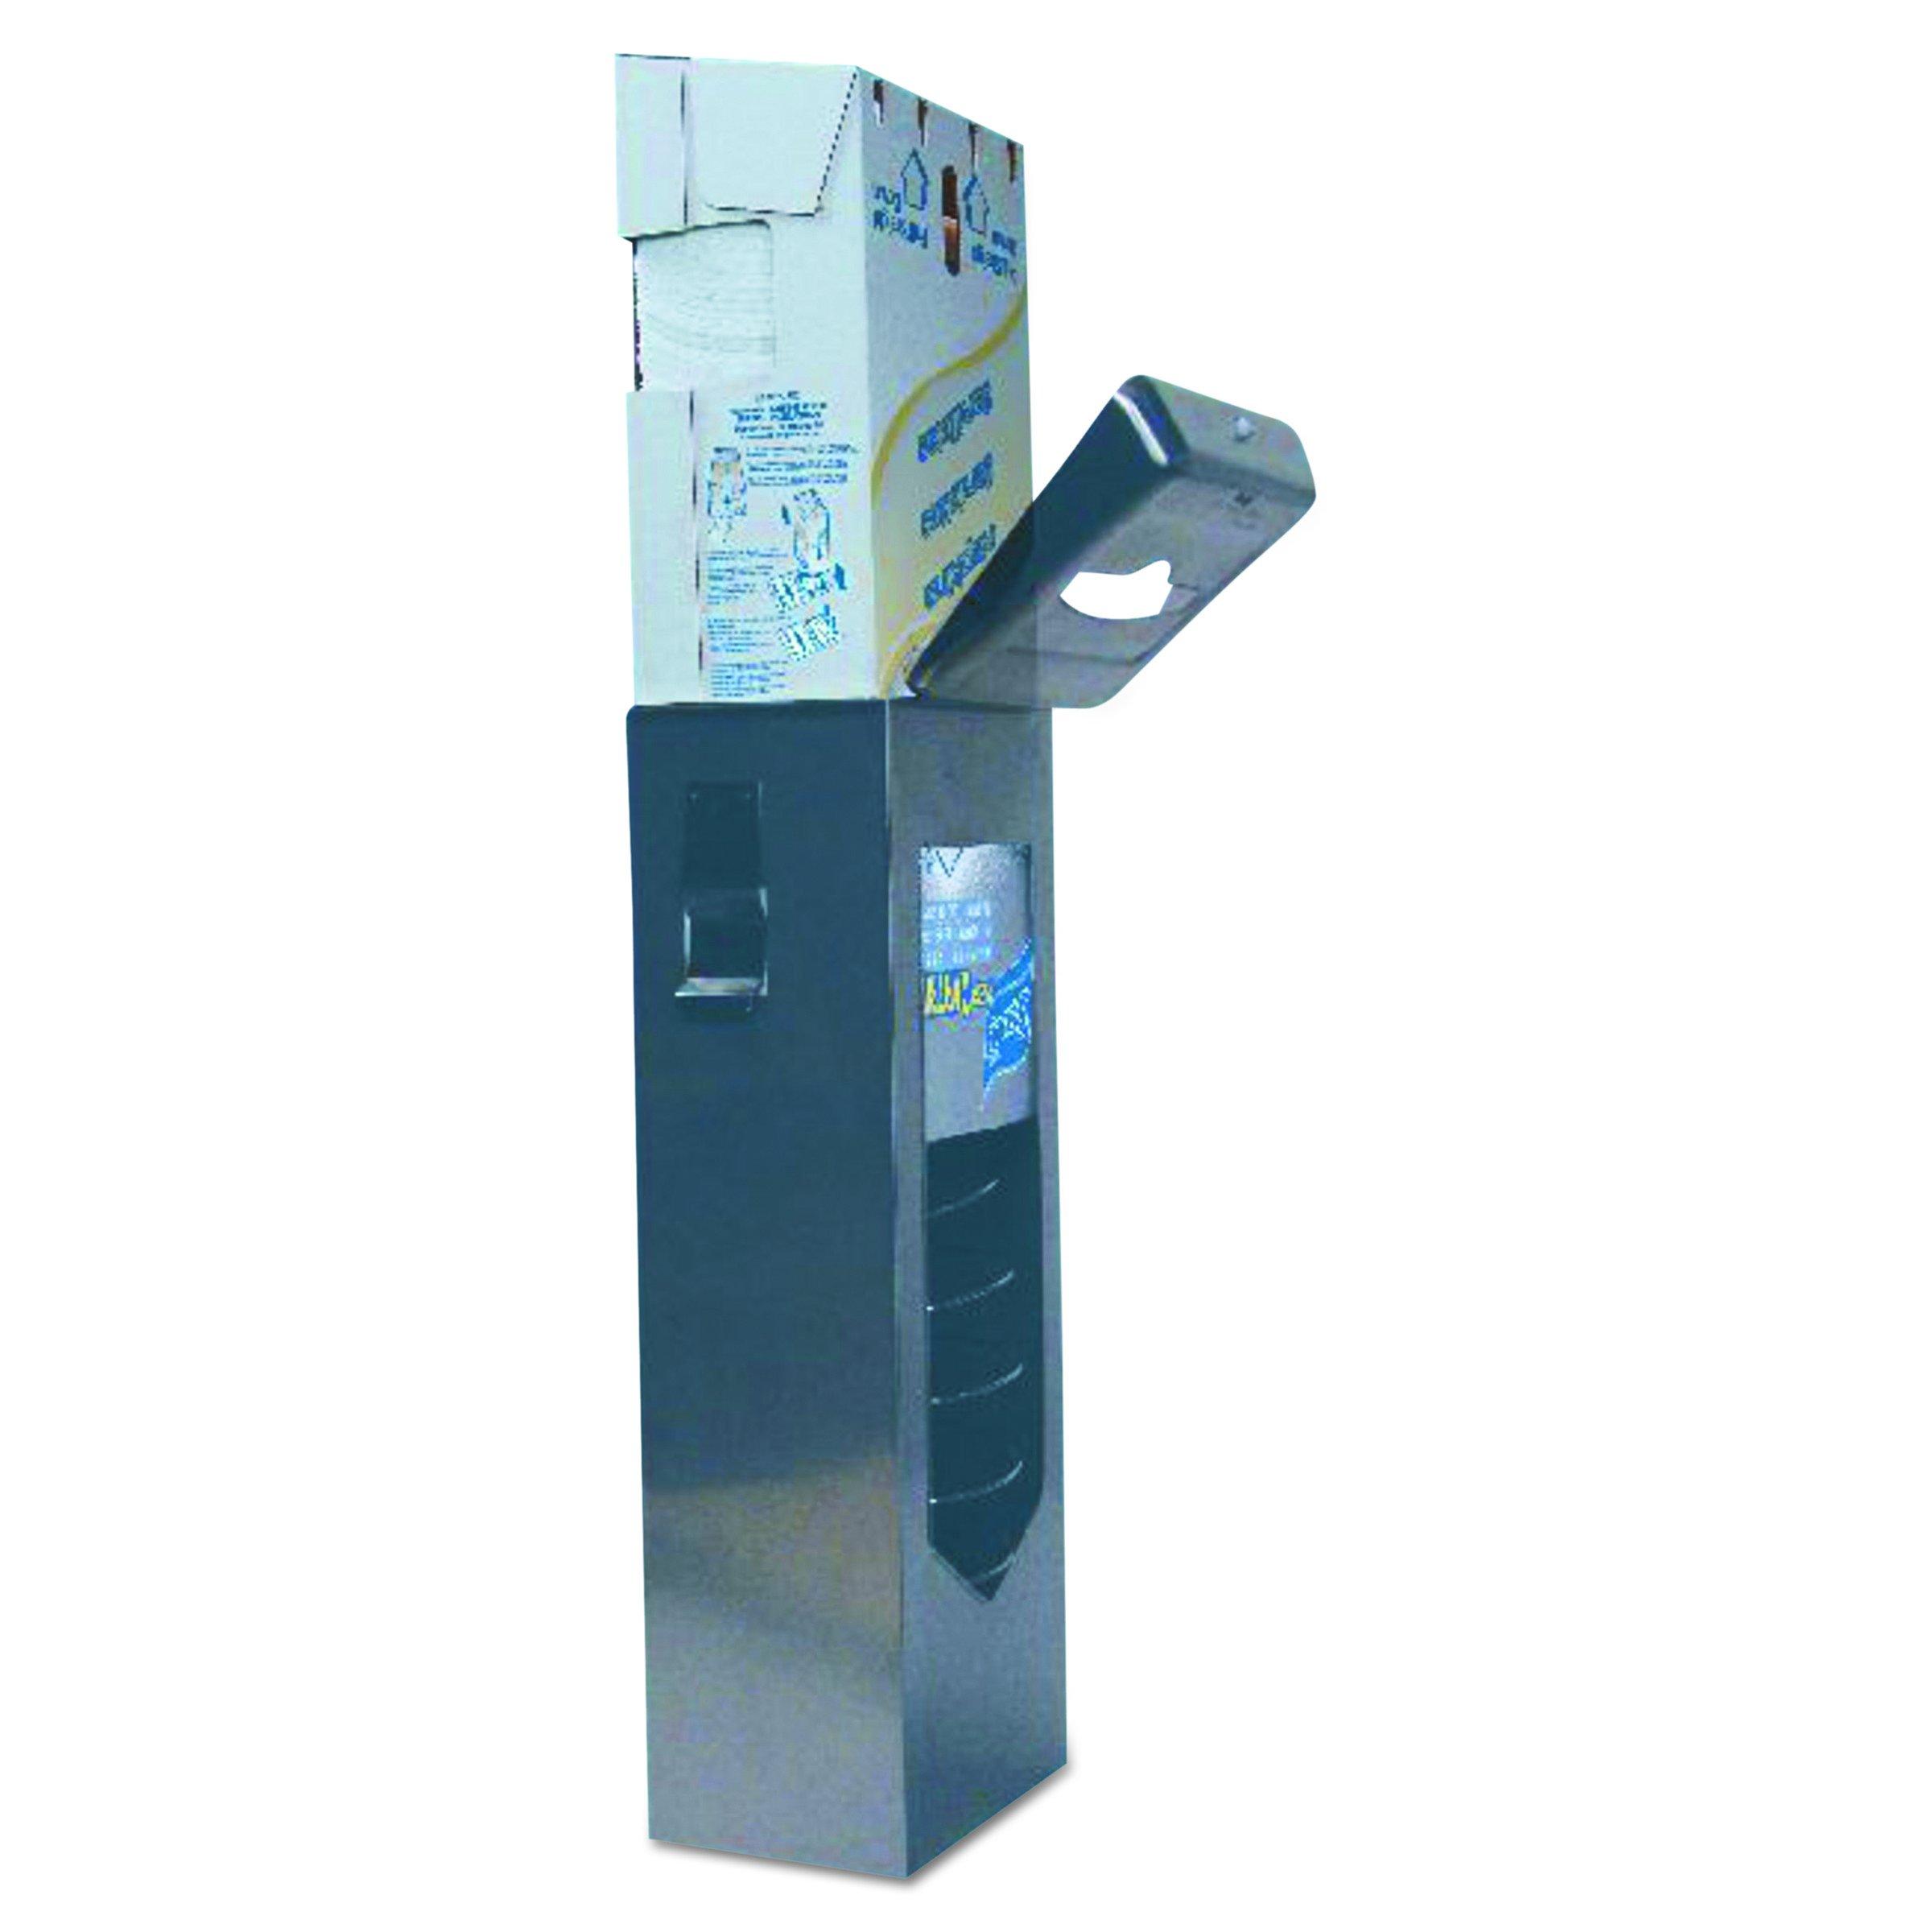 Kimberly-Clark Scott 09064 Stainless Steel Cartridge In-Counter Mount Dispenser by Kimberly-Clark Professional